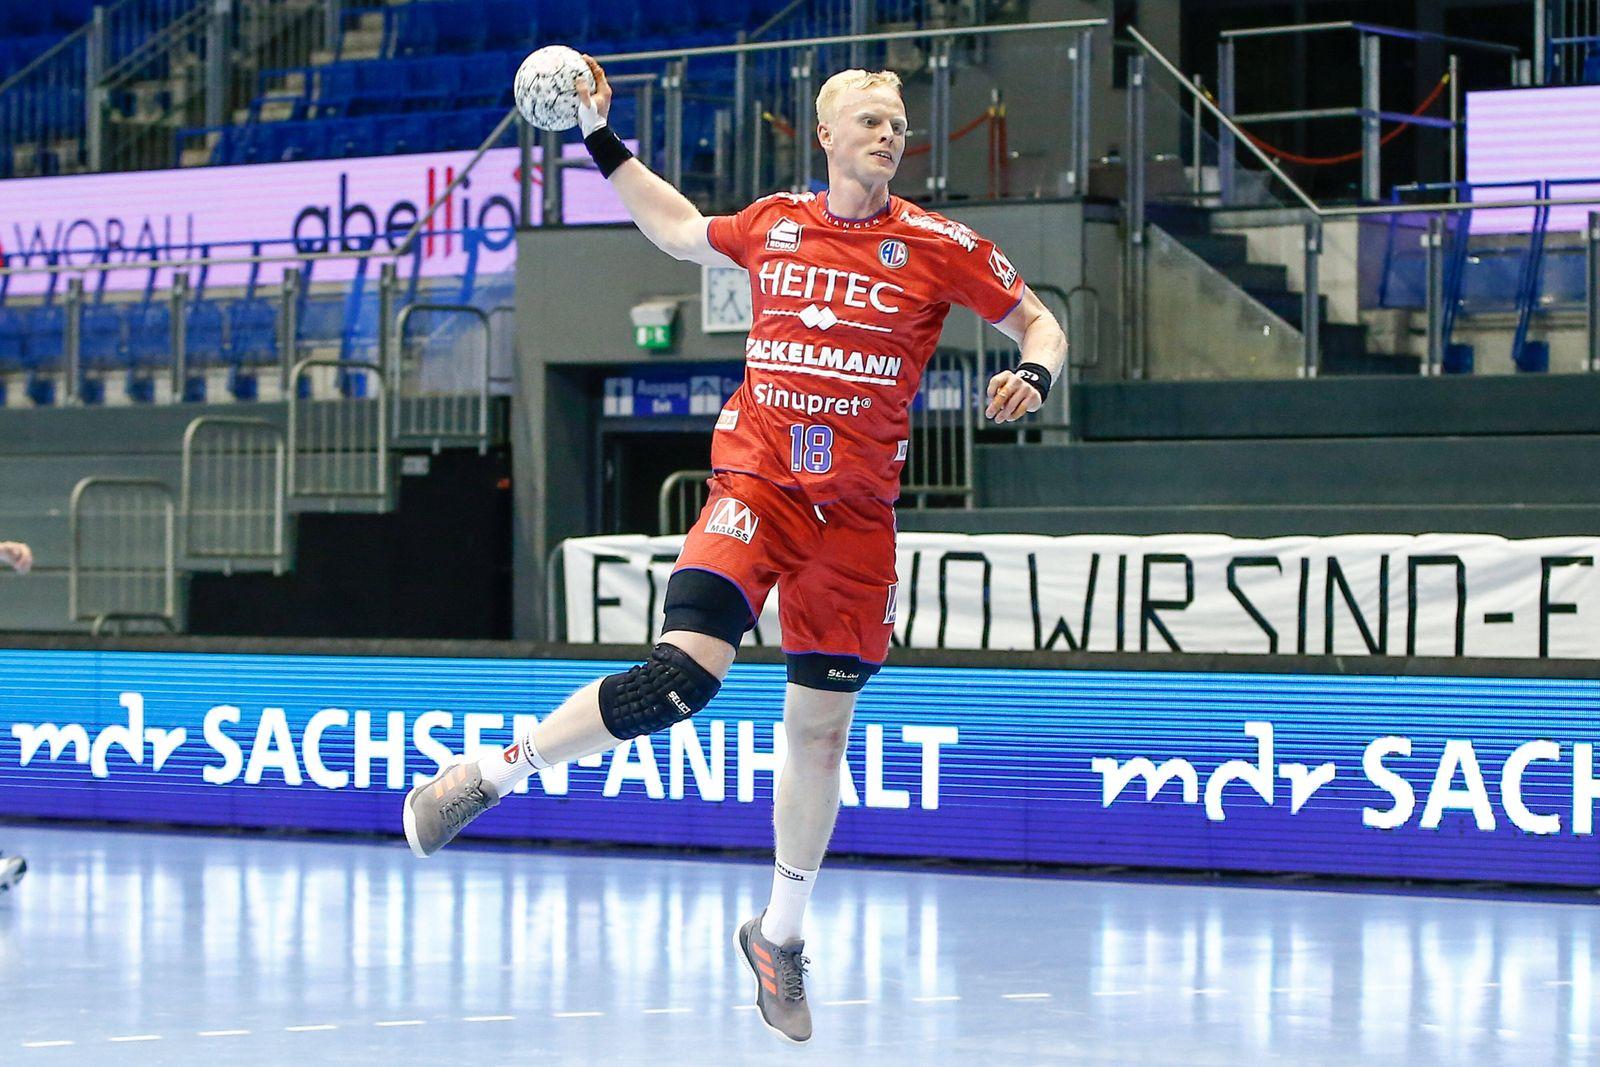 16.12.2020, xtgx, Handball Liqui Moly HBL, SC Magdeburg - HC Erlangen emspor, v.l. Sebastian Firnhaber (Erlangen, 18) w